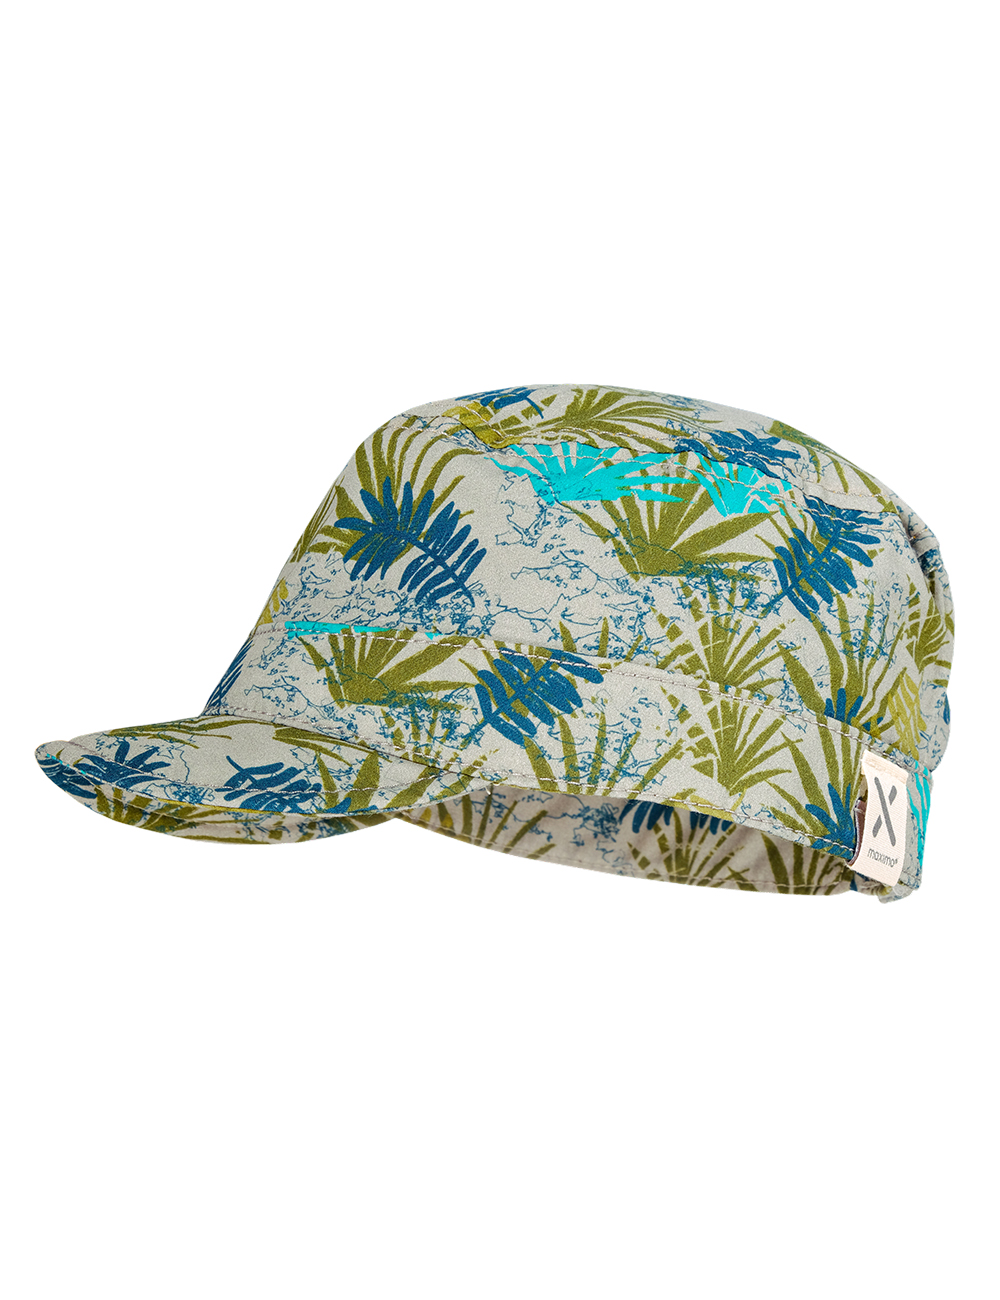 BOY-Cap 55 Maximo. Farbe: sand-grün-palmenblätter, Größe: 55